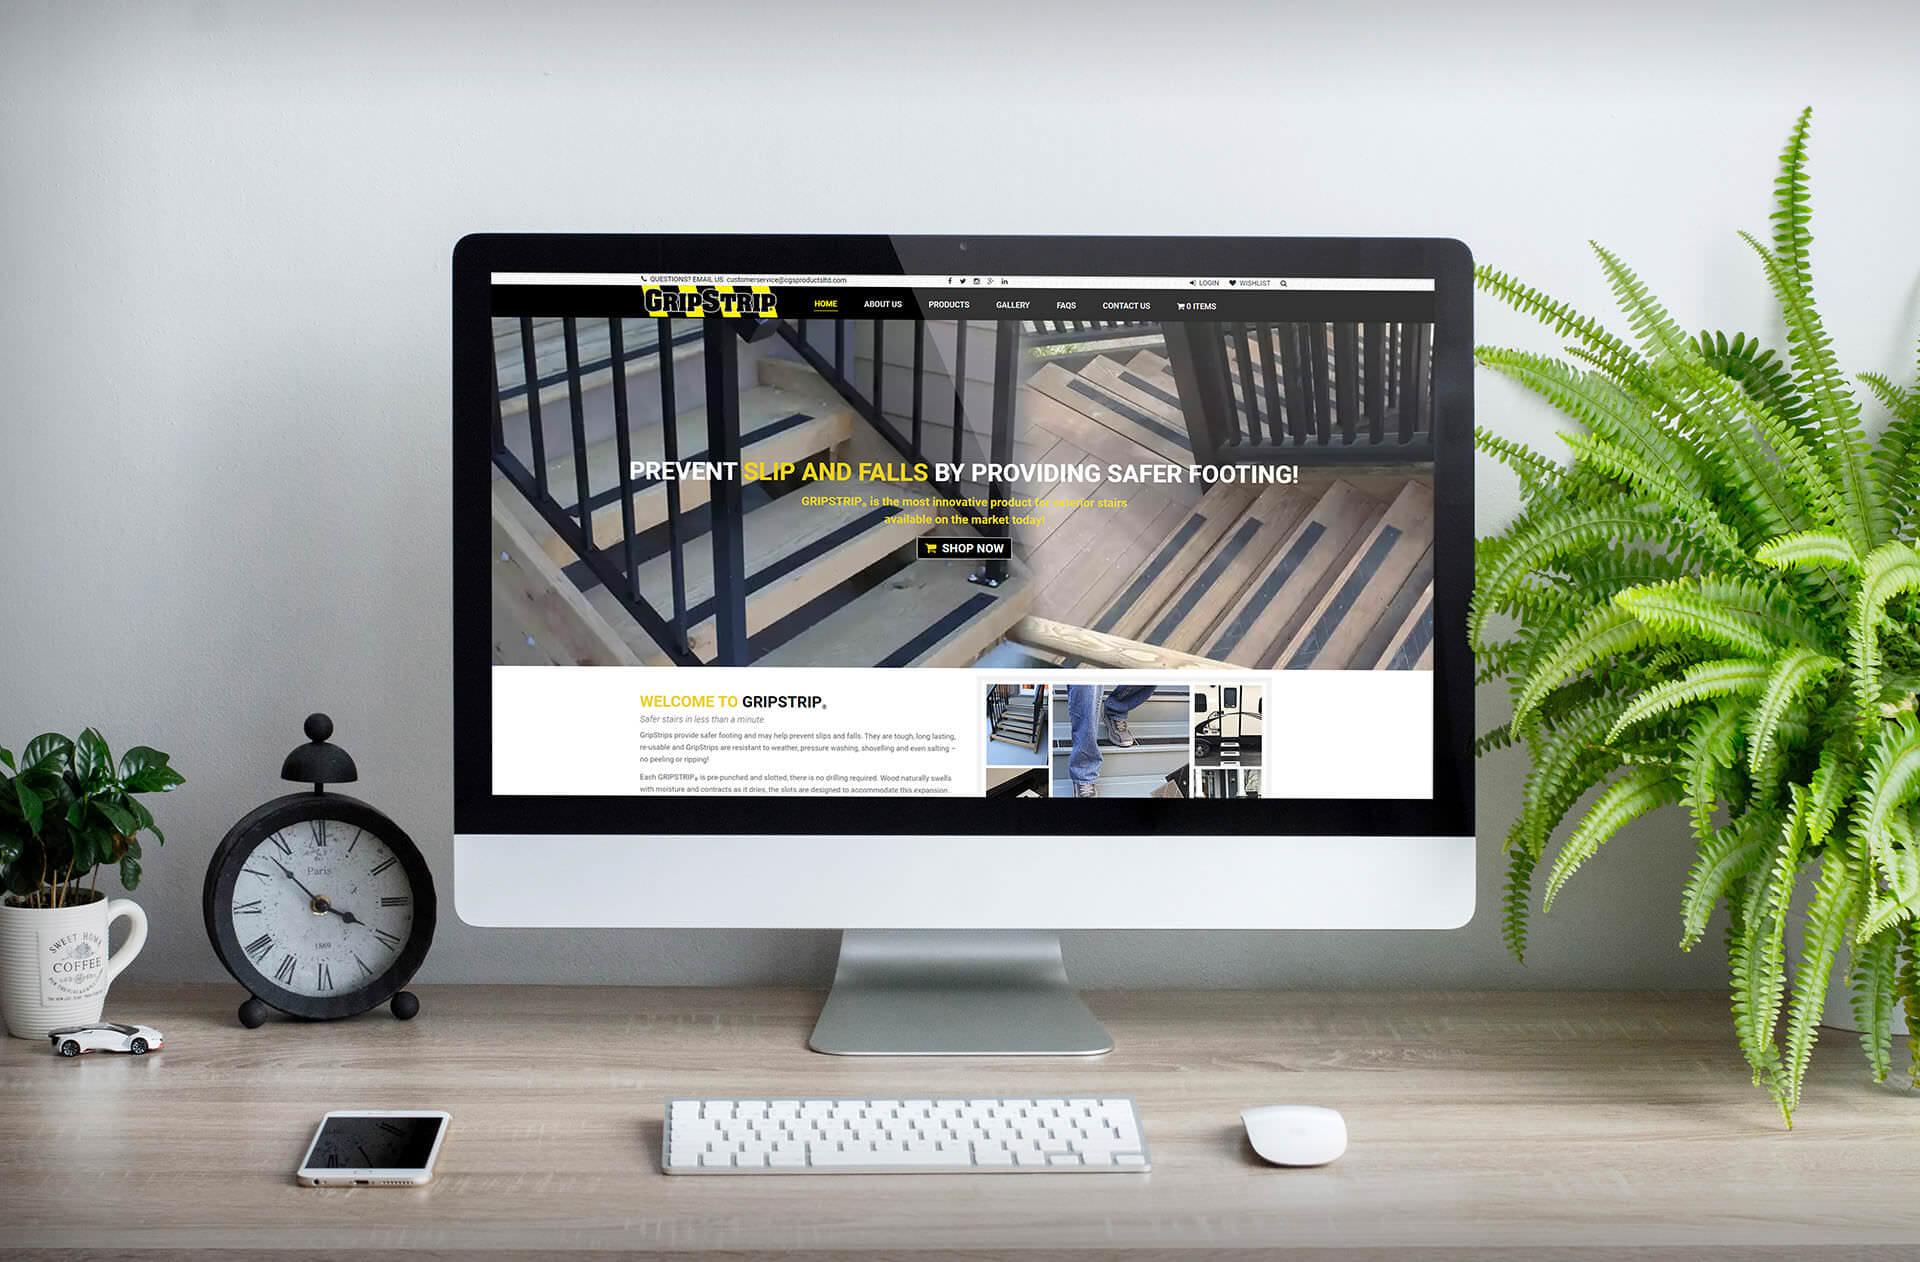 BMGcreative - GripStrips ® Web Mockup